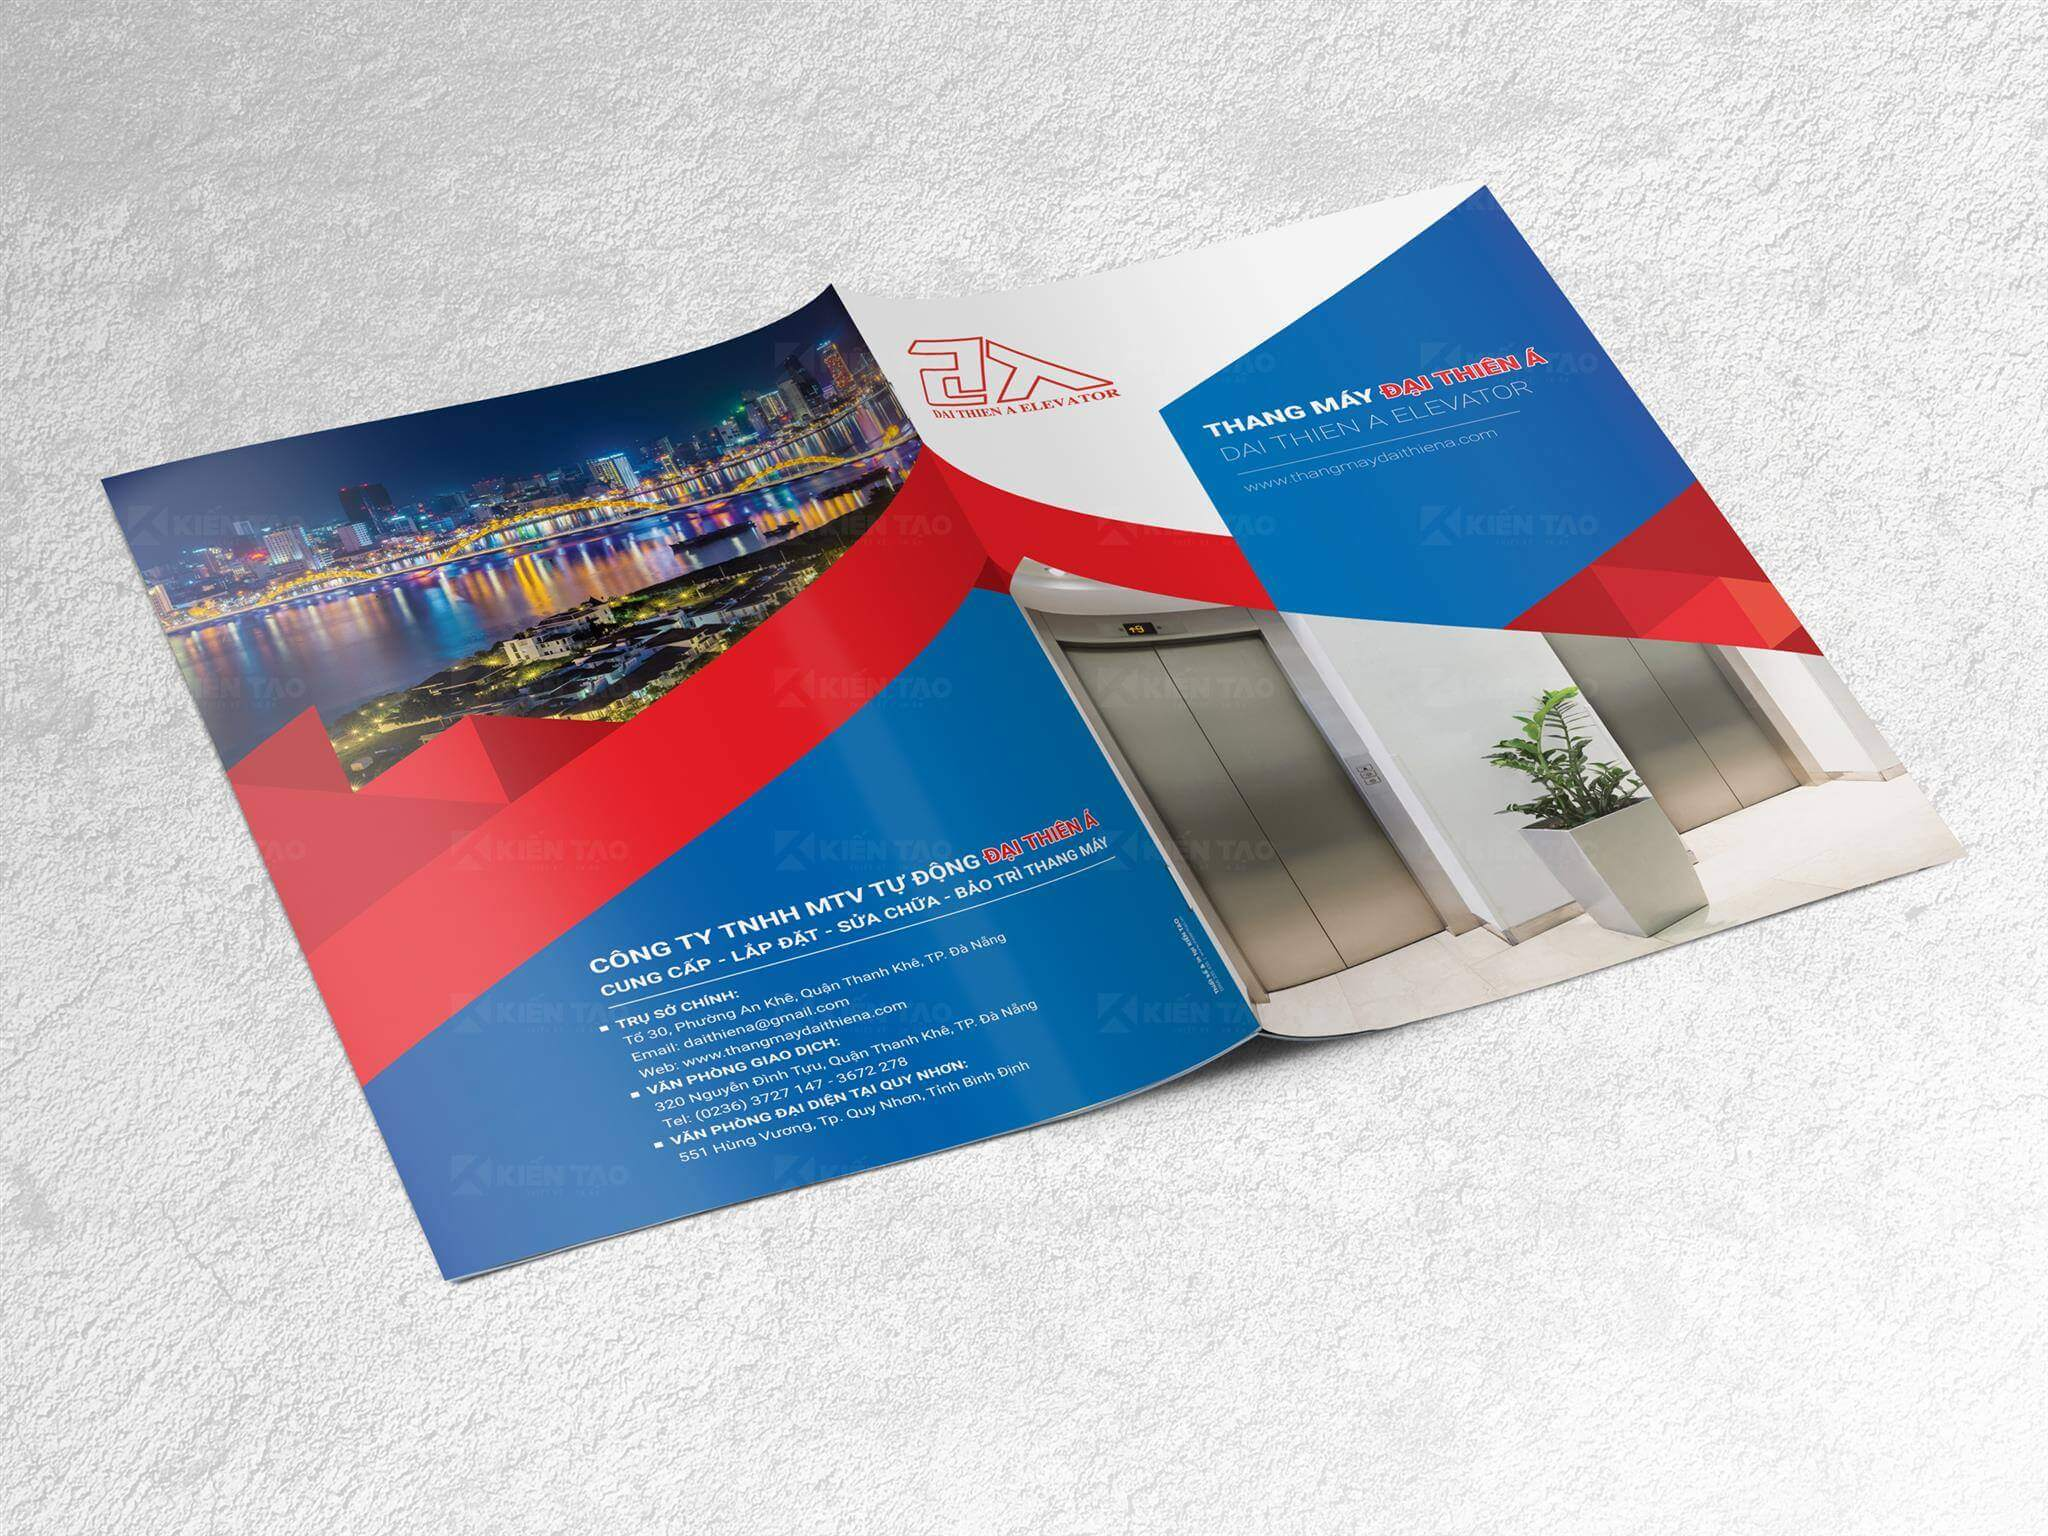 catalogue daithiena4 - Đại Thiên Á